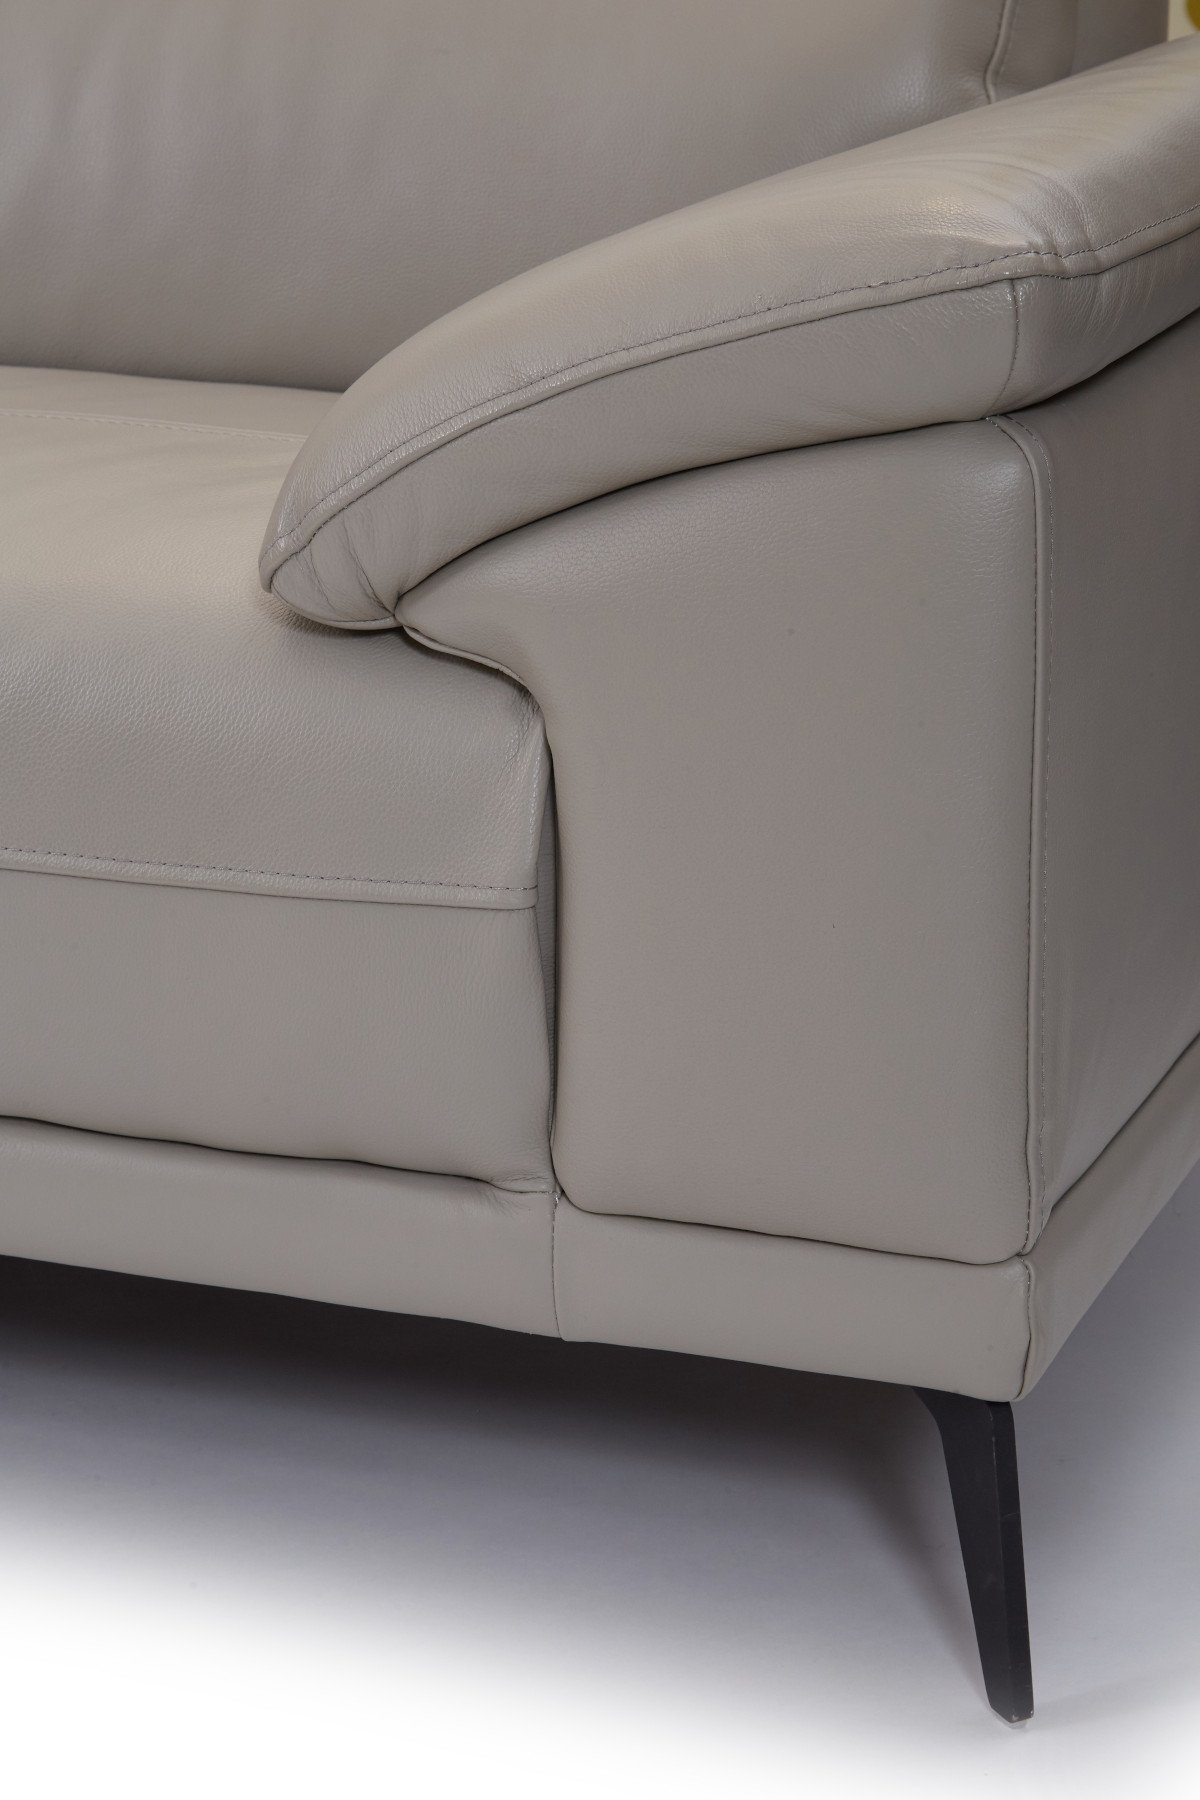 Montero LHF Corner Sofa - Leather